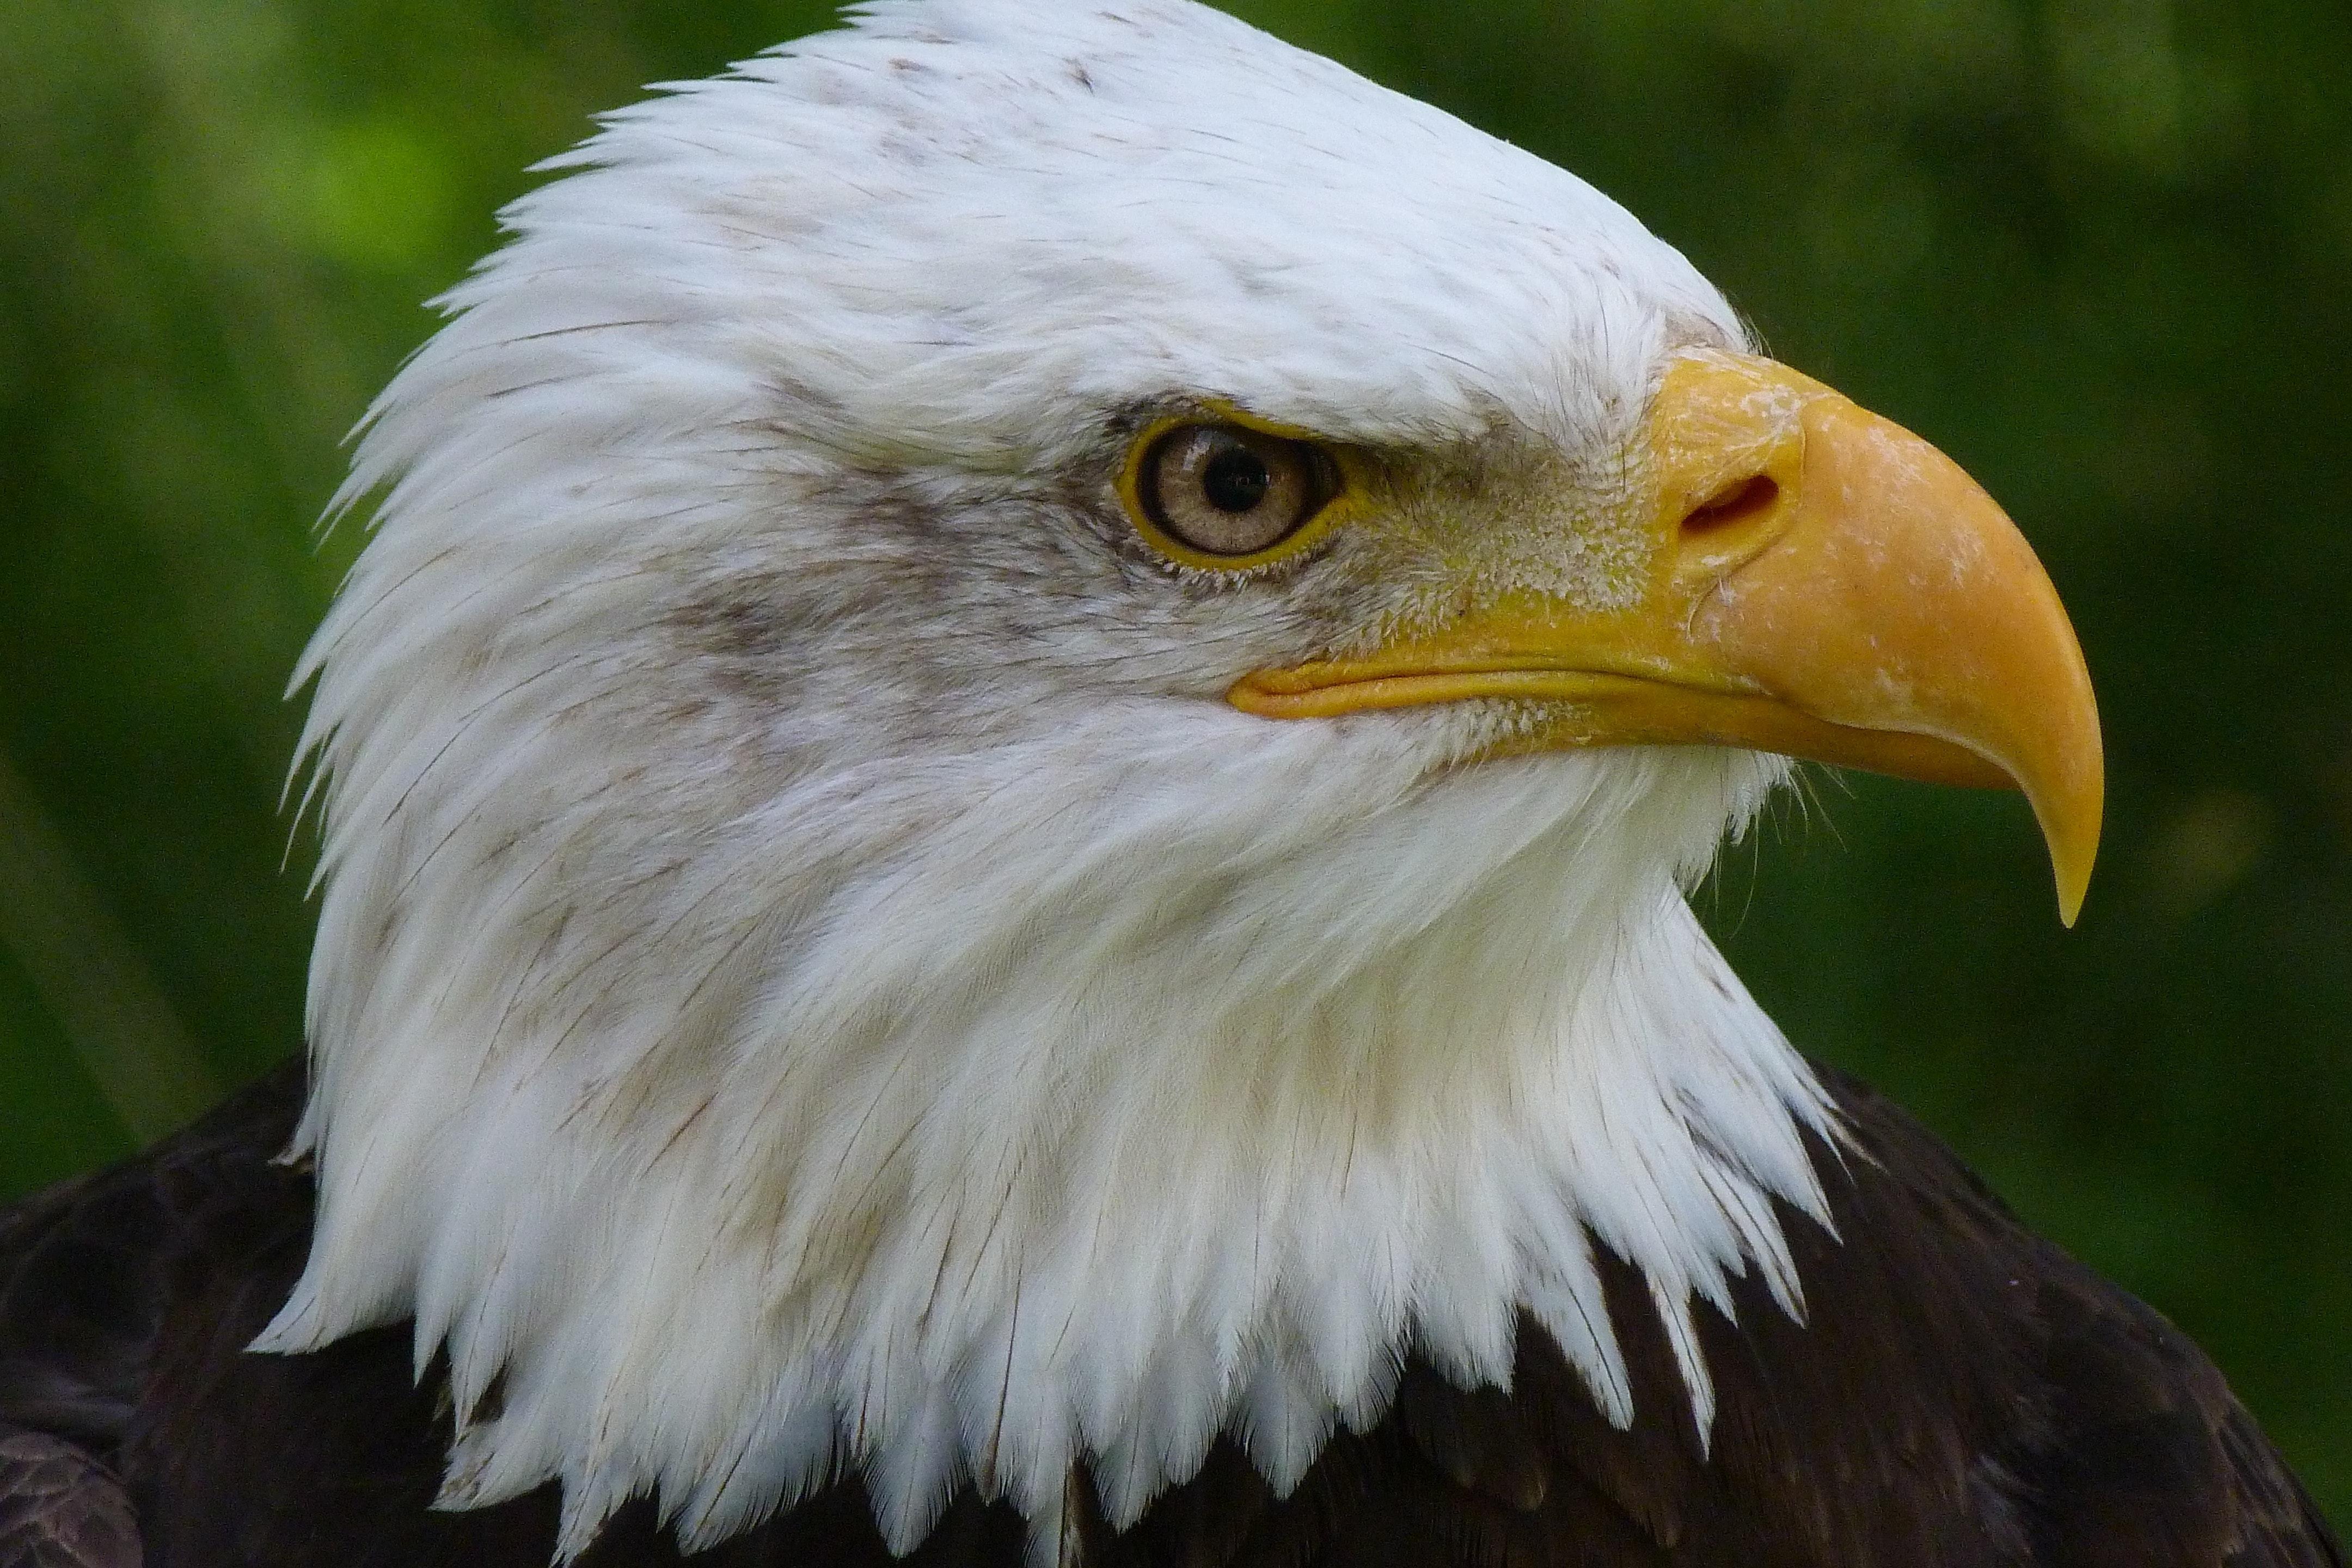 Eagle beak - photo#41